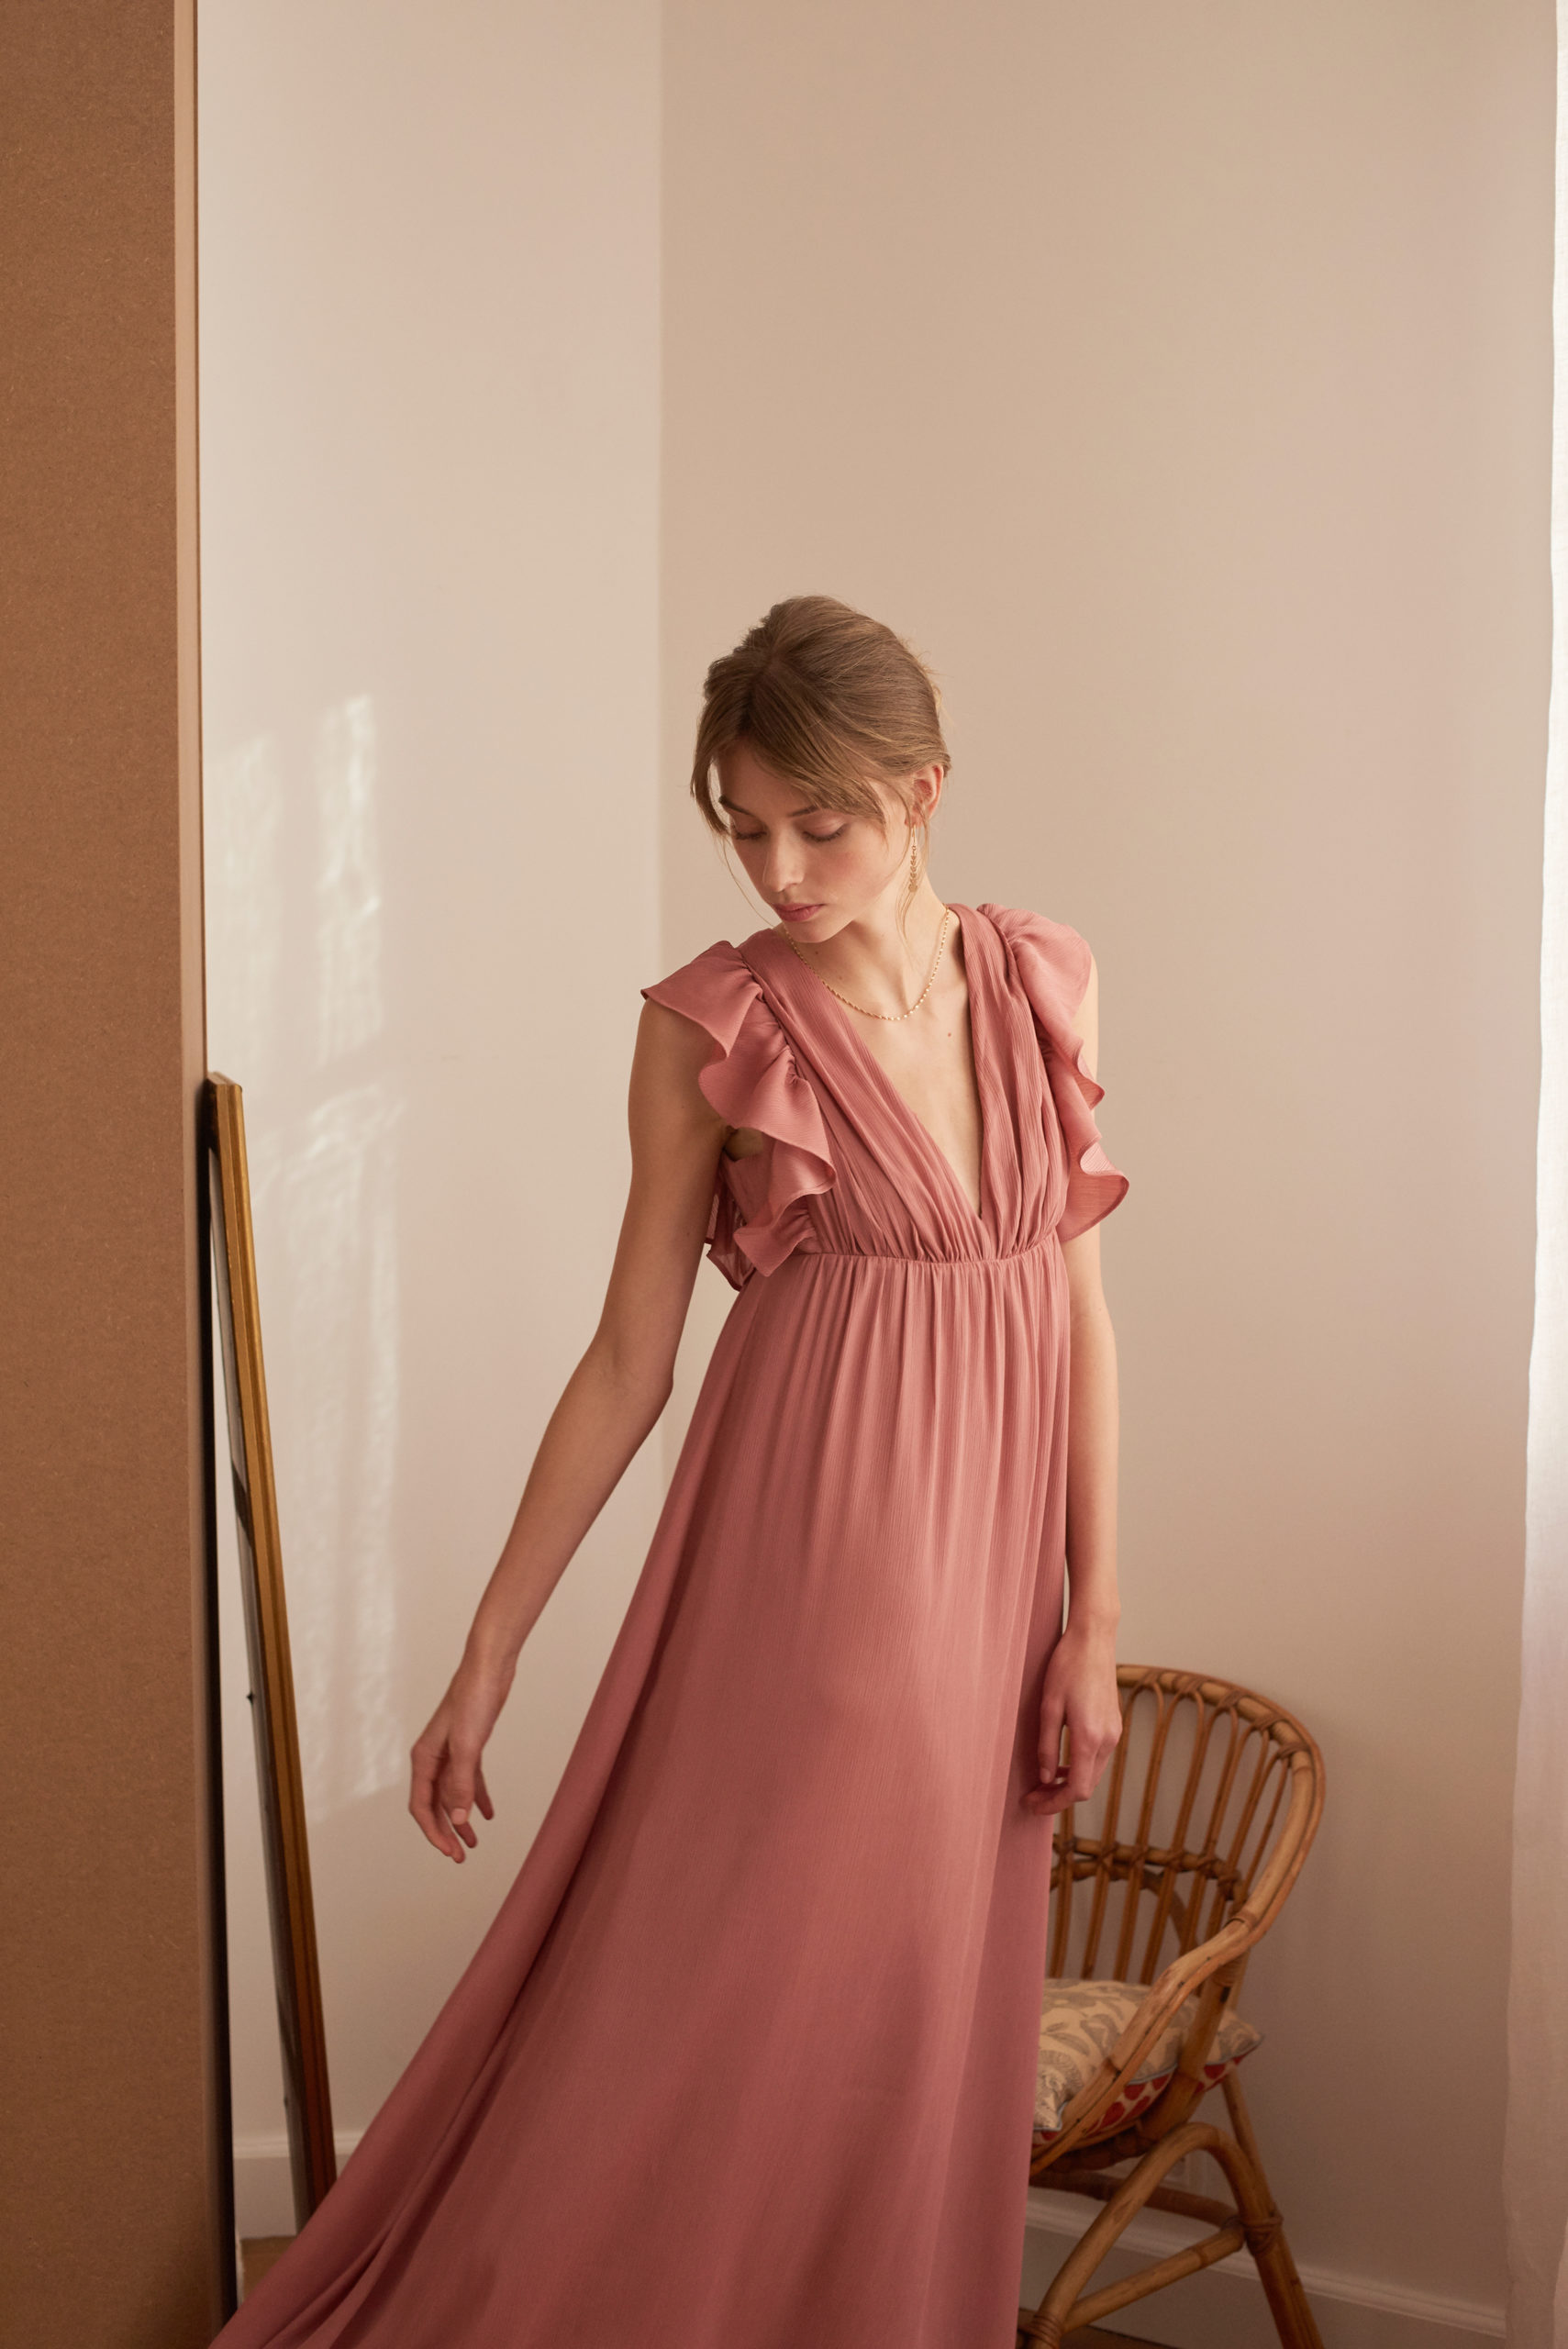 Robe Invitee Mariage Les Plus Beaux Modeles A Porter